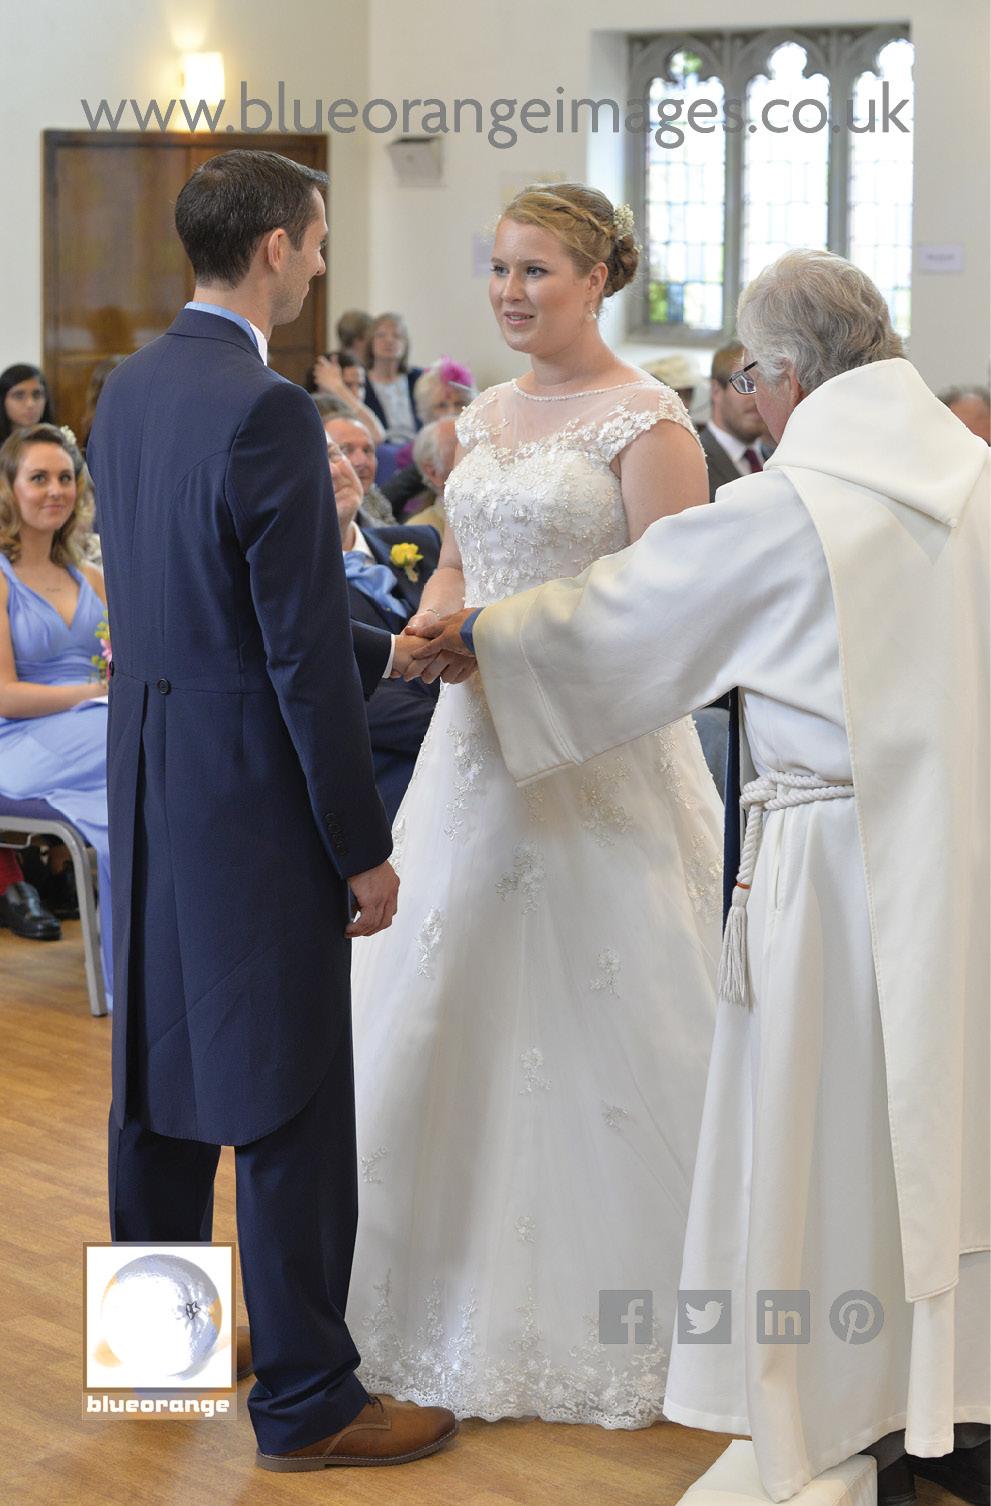 Katriona & Nick's wedding ceremony St Albans